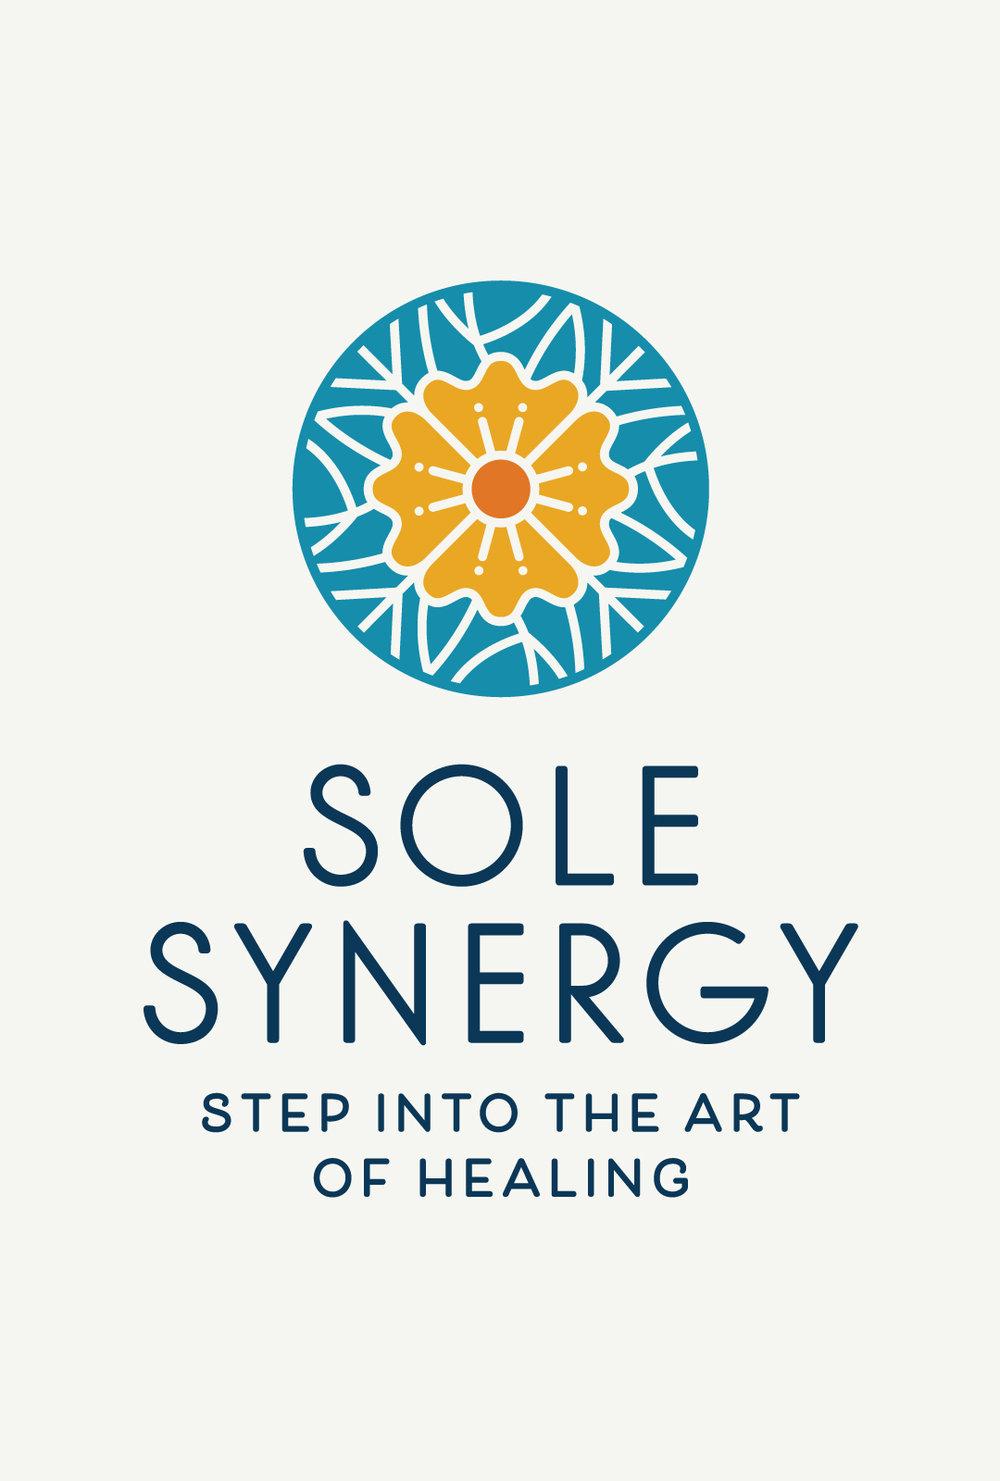 Sole-Synergy-Logo-Vertical-02.jpg